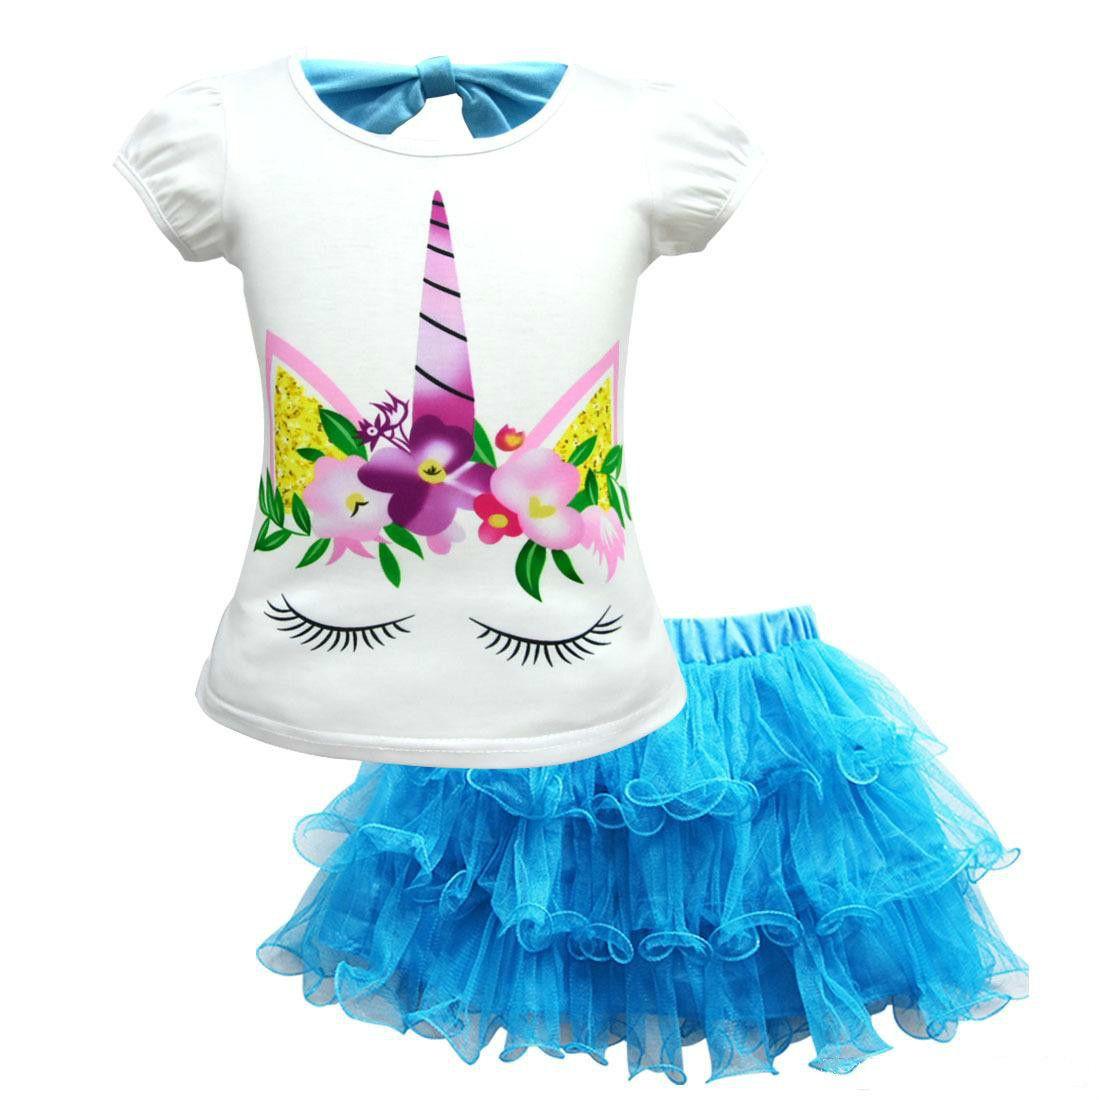 0ee6d064 2019 Wholesale Baby Girls Unicorn Sets 2019 New Summer Cartoon Kids Girl  Unicorn Print T Shirts + Gauze Tutu Skirts Suits Children Clothing From  Jiaabc66, ...